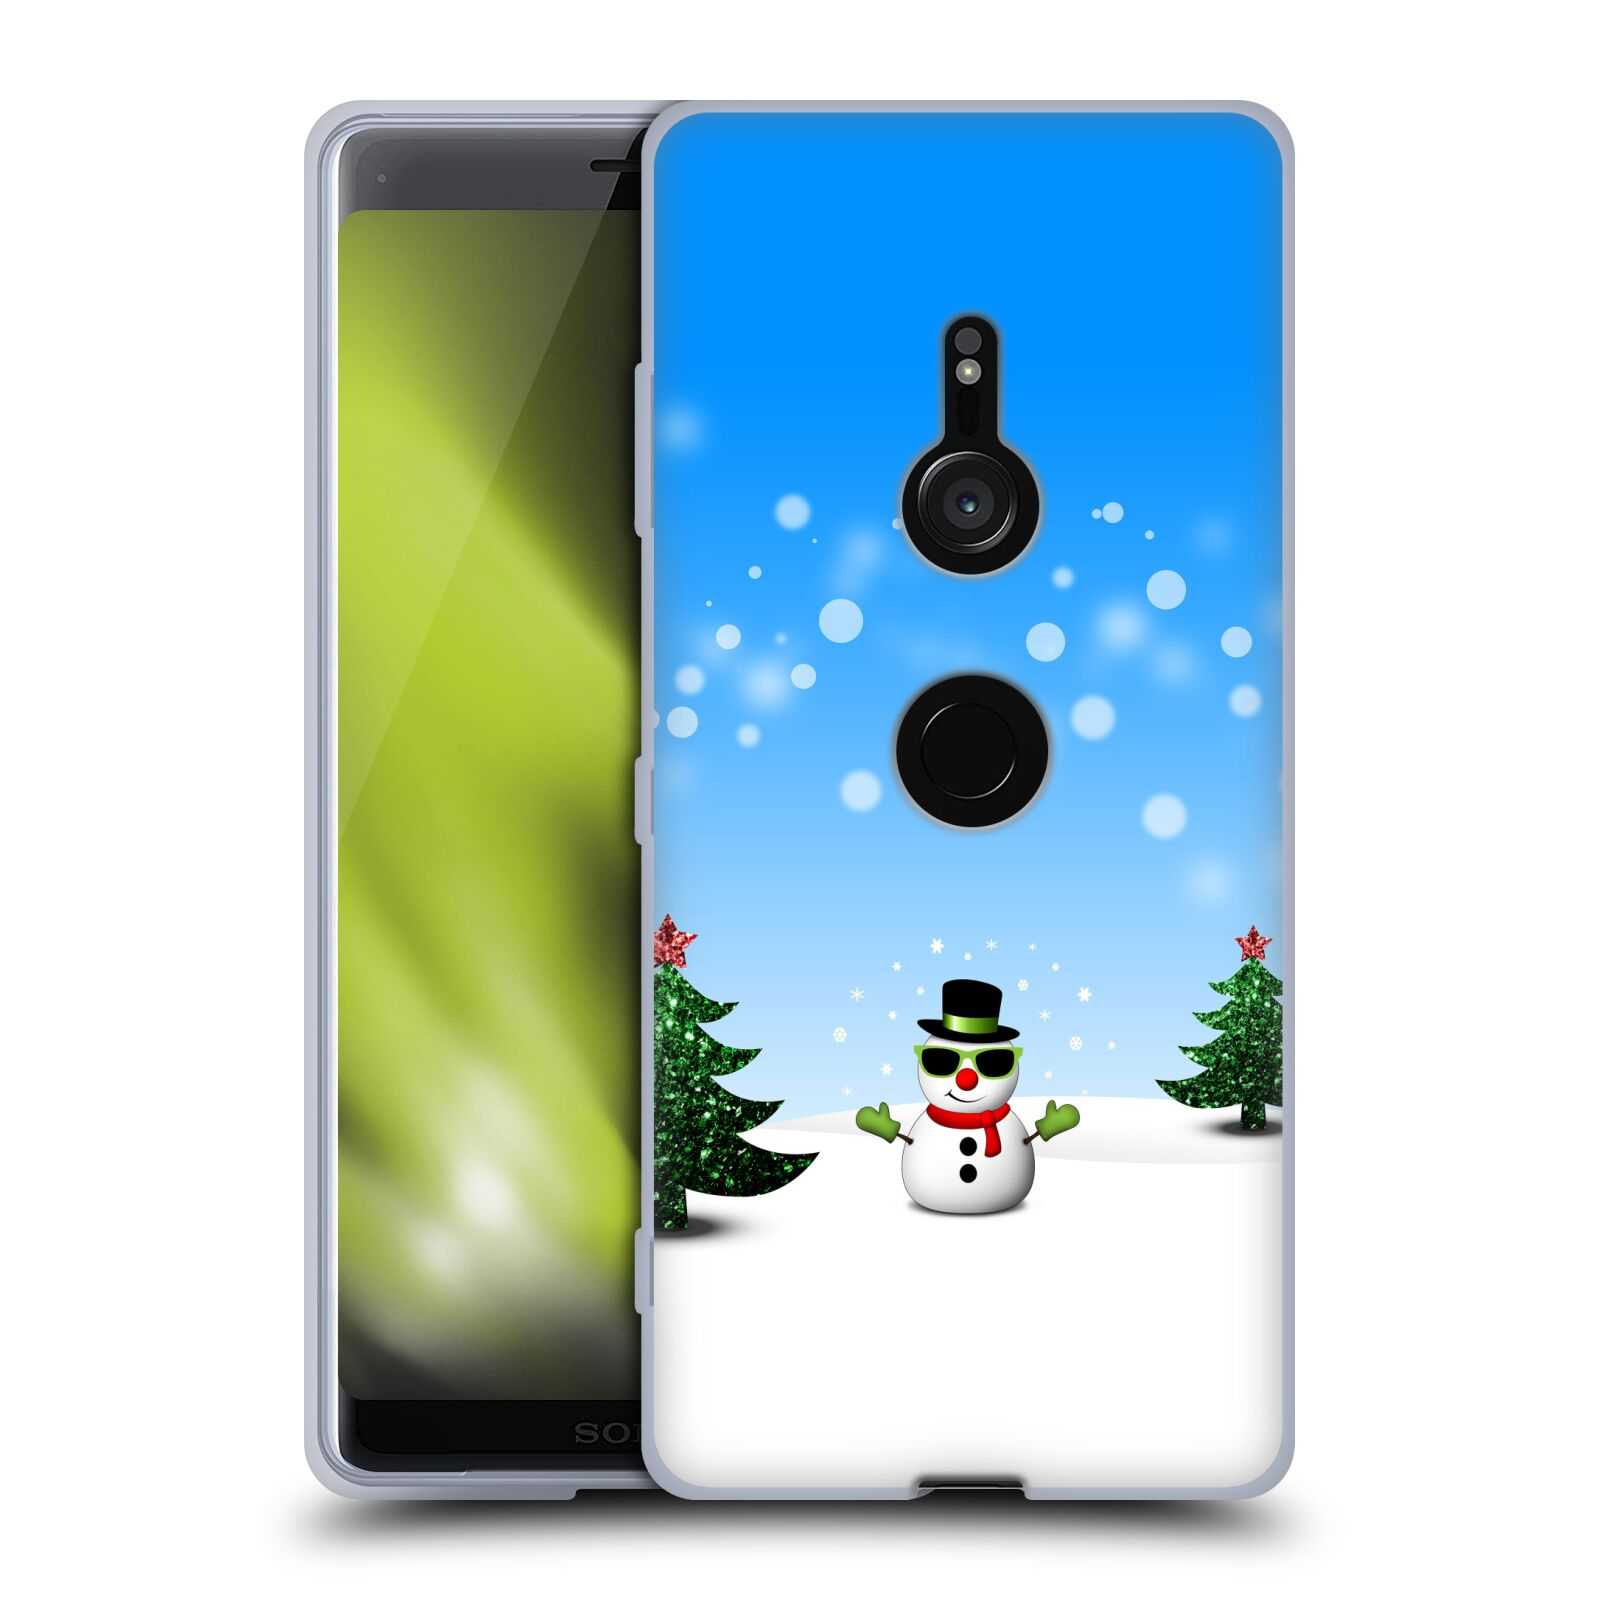 Xperia 5 返品送料無料 II 5G 10 1 L4 安い 激安 プチプラ 高品質 Sony ソフトジェルケース クリスマス PLdesign 電話 オフィシャル